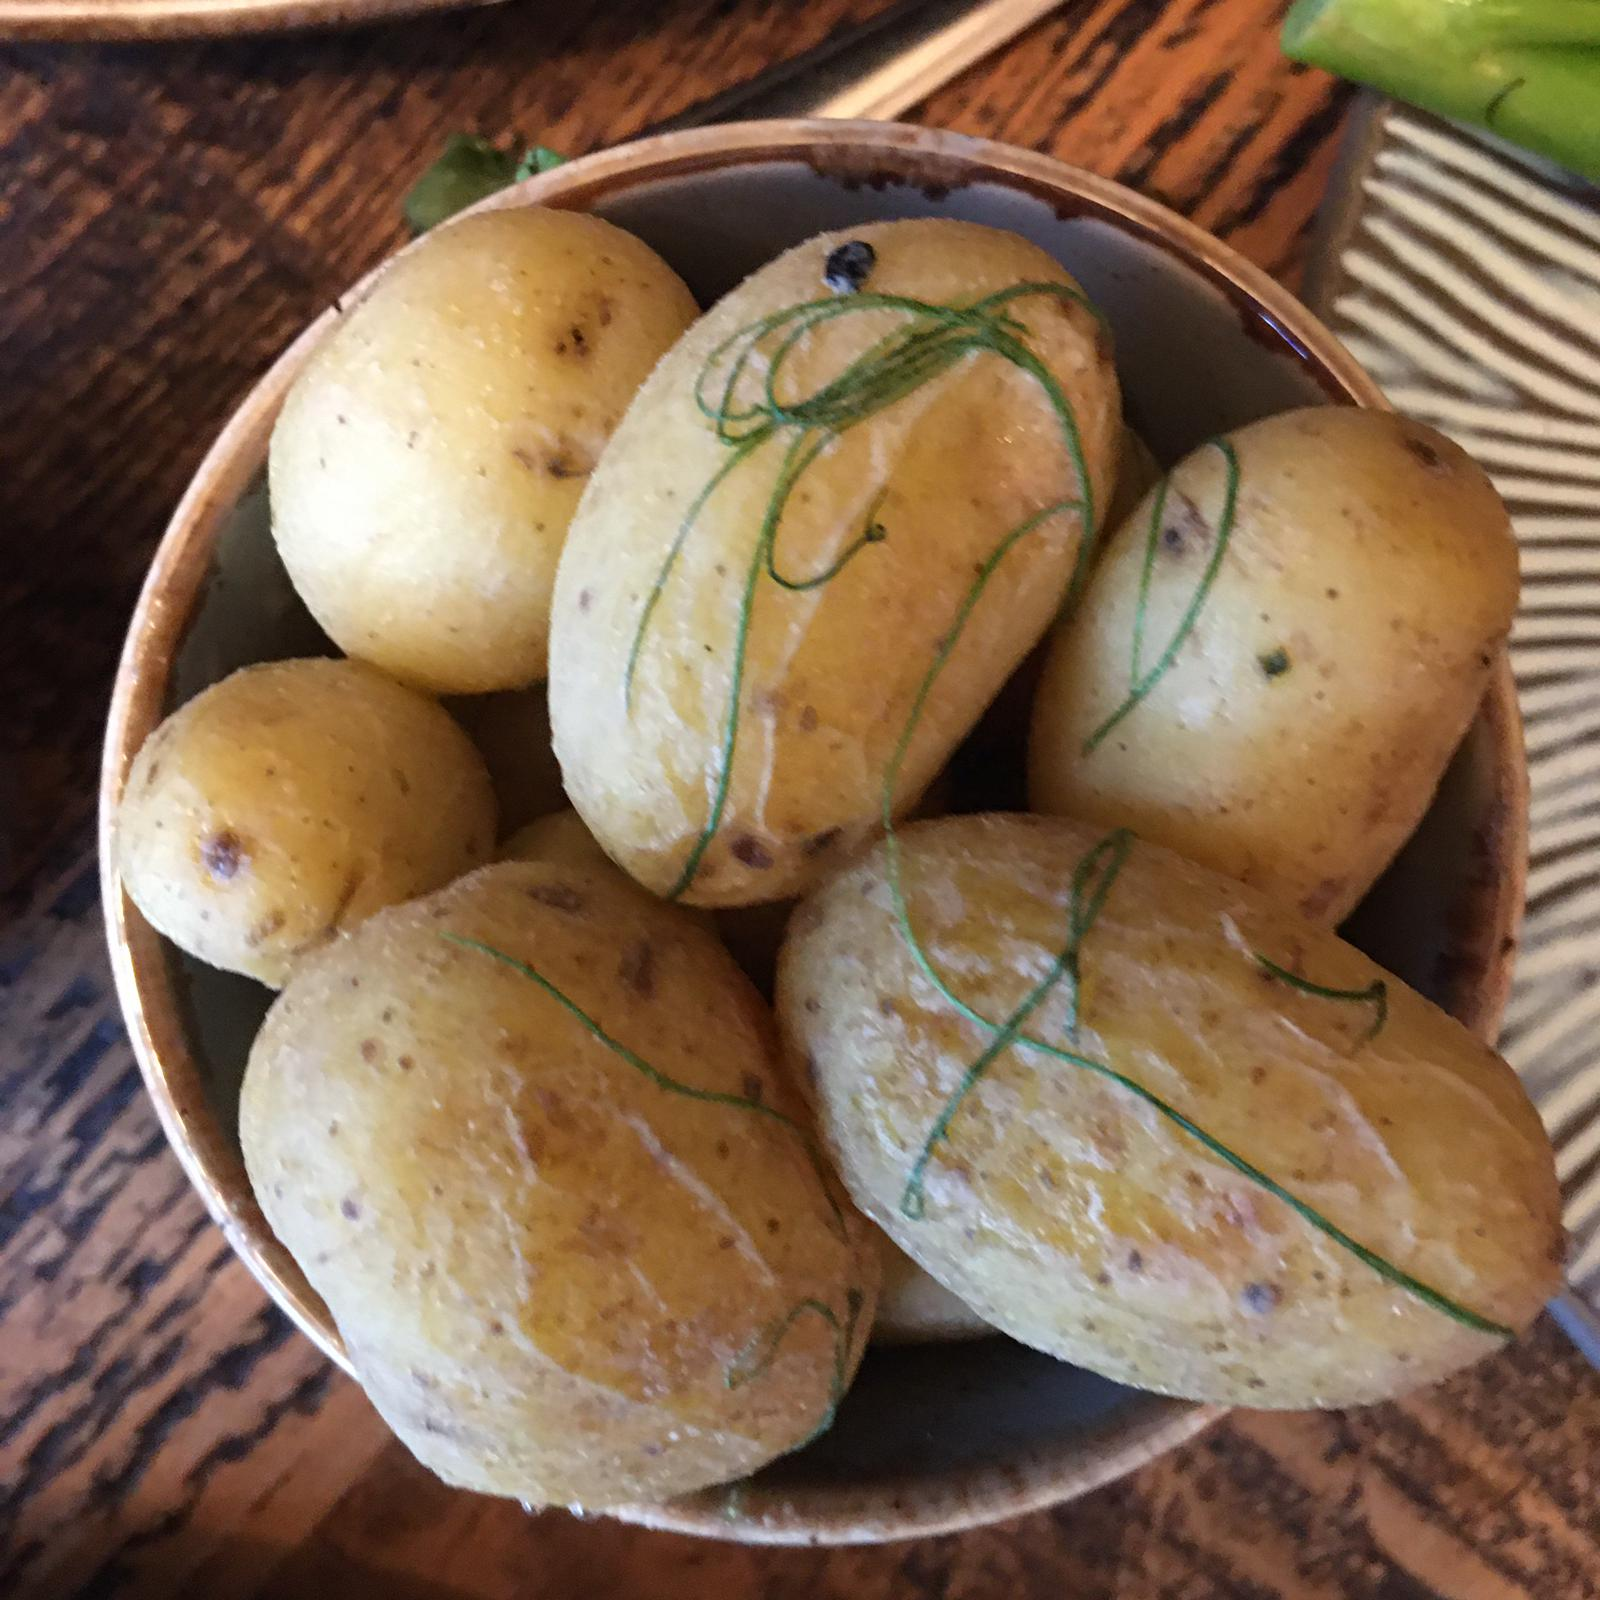 New Potatoes Essentials Menu Coach House Inn Winterbourne Abbas Dorset